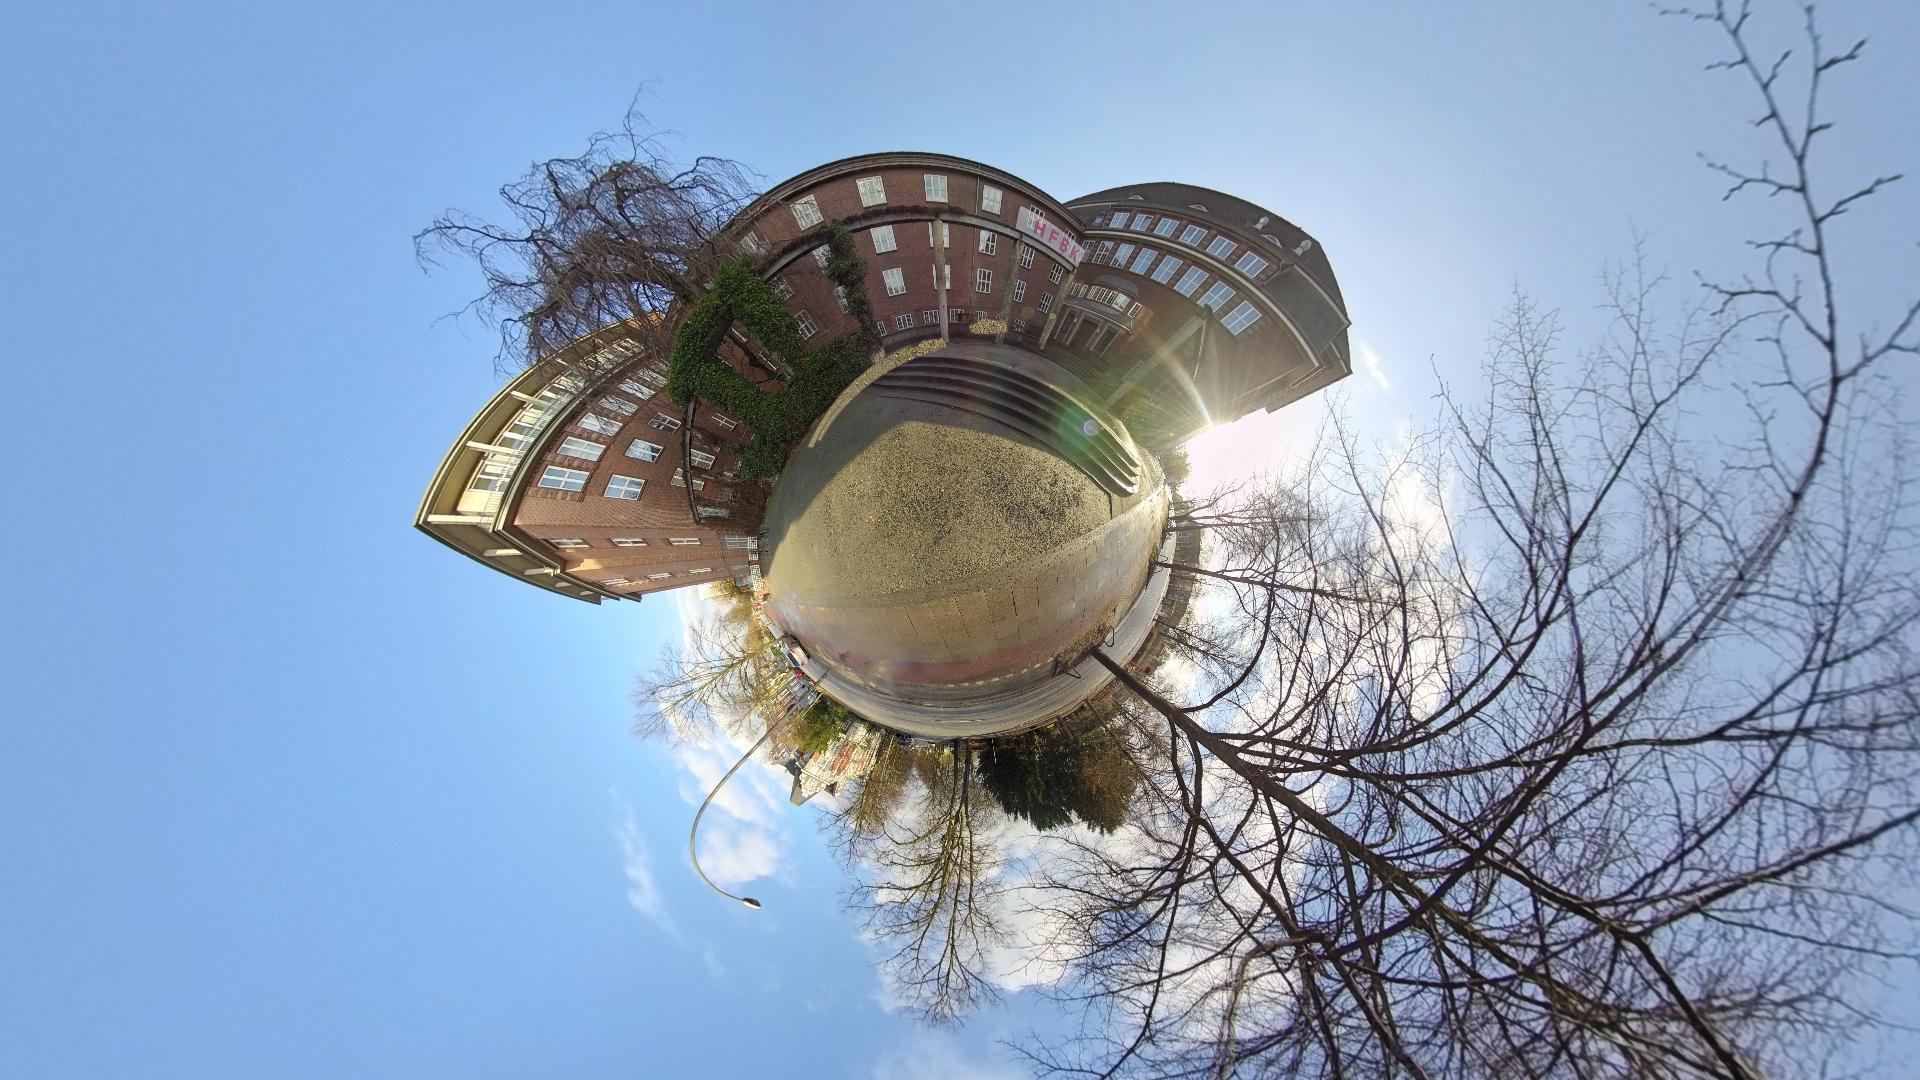 HFBK in Virtual Reality